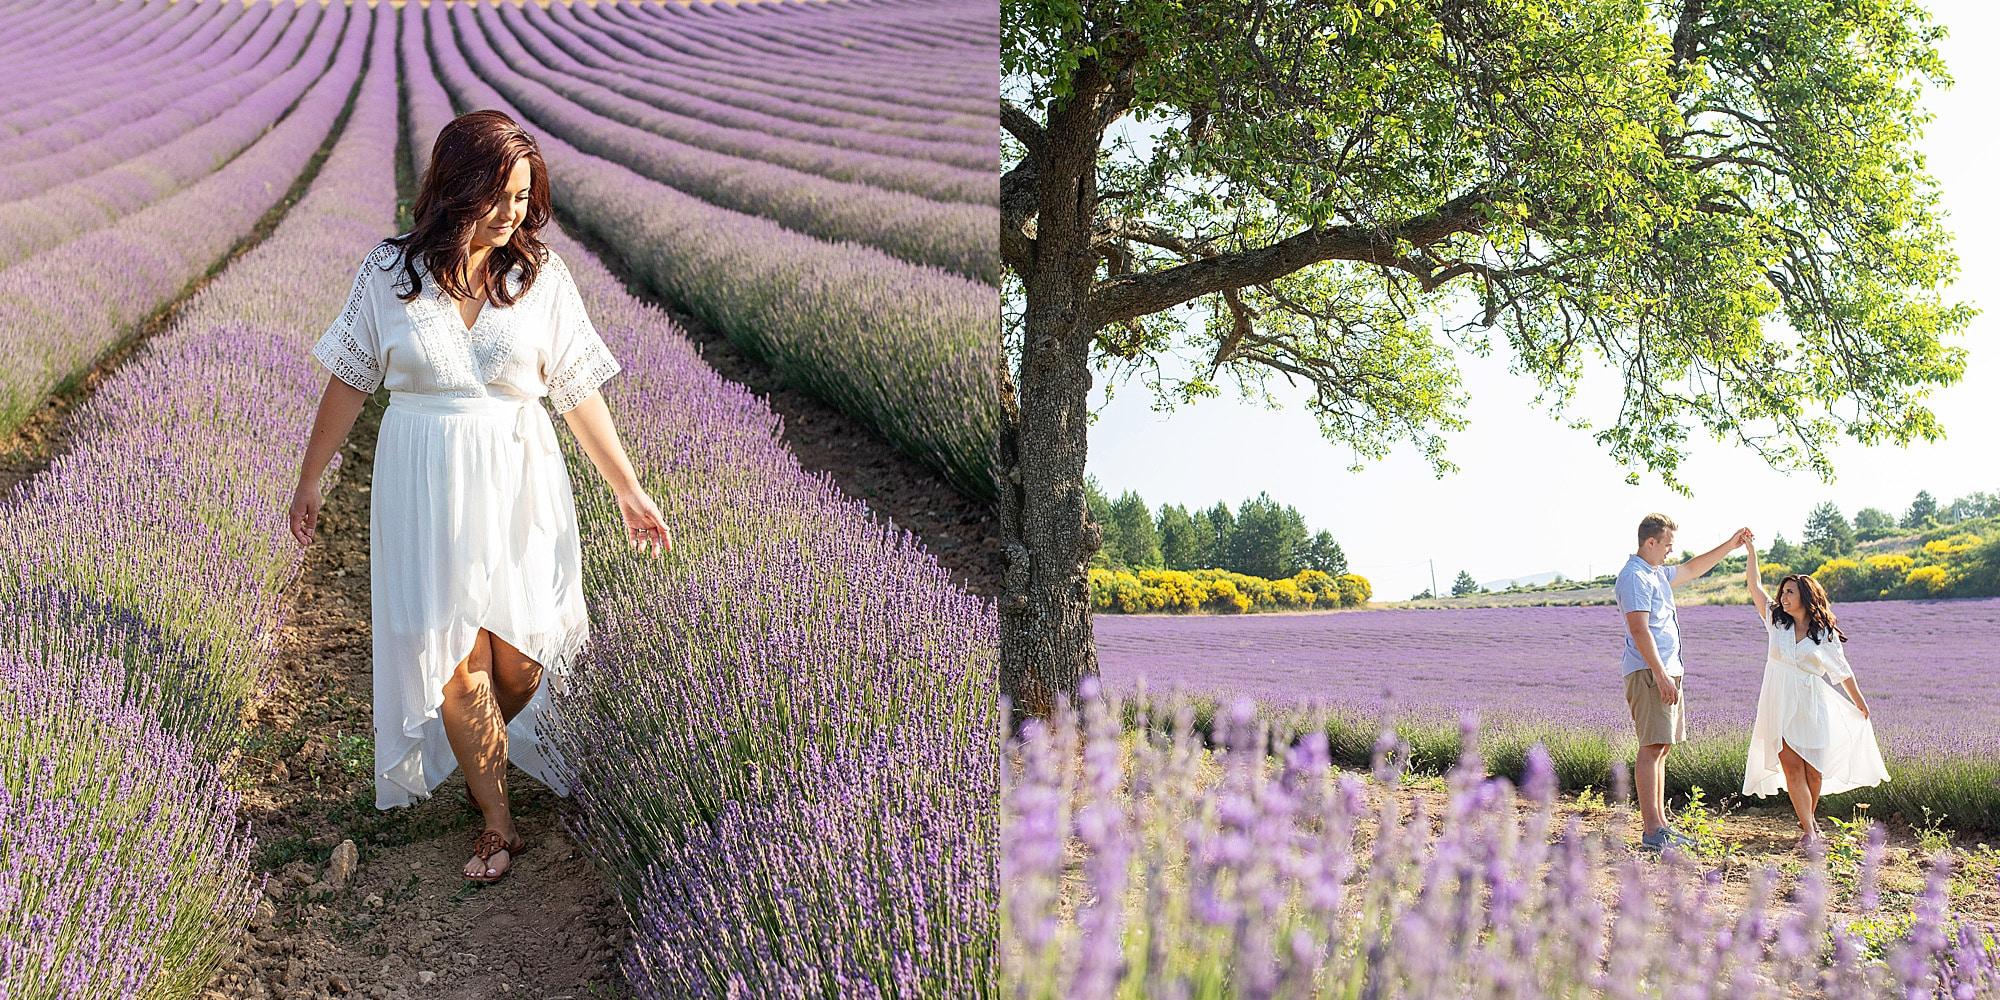 Marie-Calfopoulos-Paris-Provence-Photographer-wedding-engagement-elopement-couple-family-lavender-fields-sault-valensole-luberon-Avignon-Provence_0002